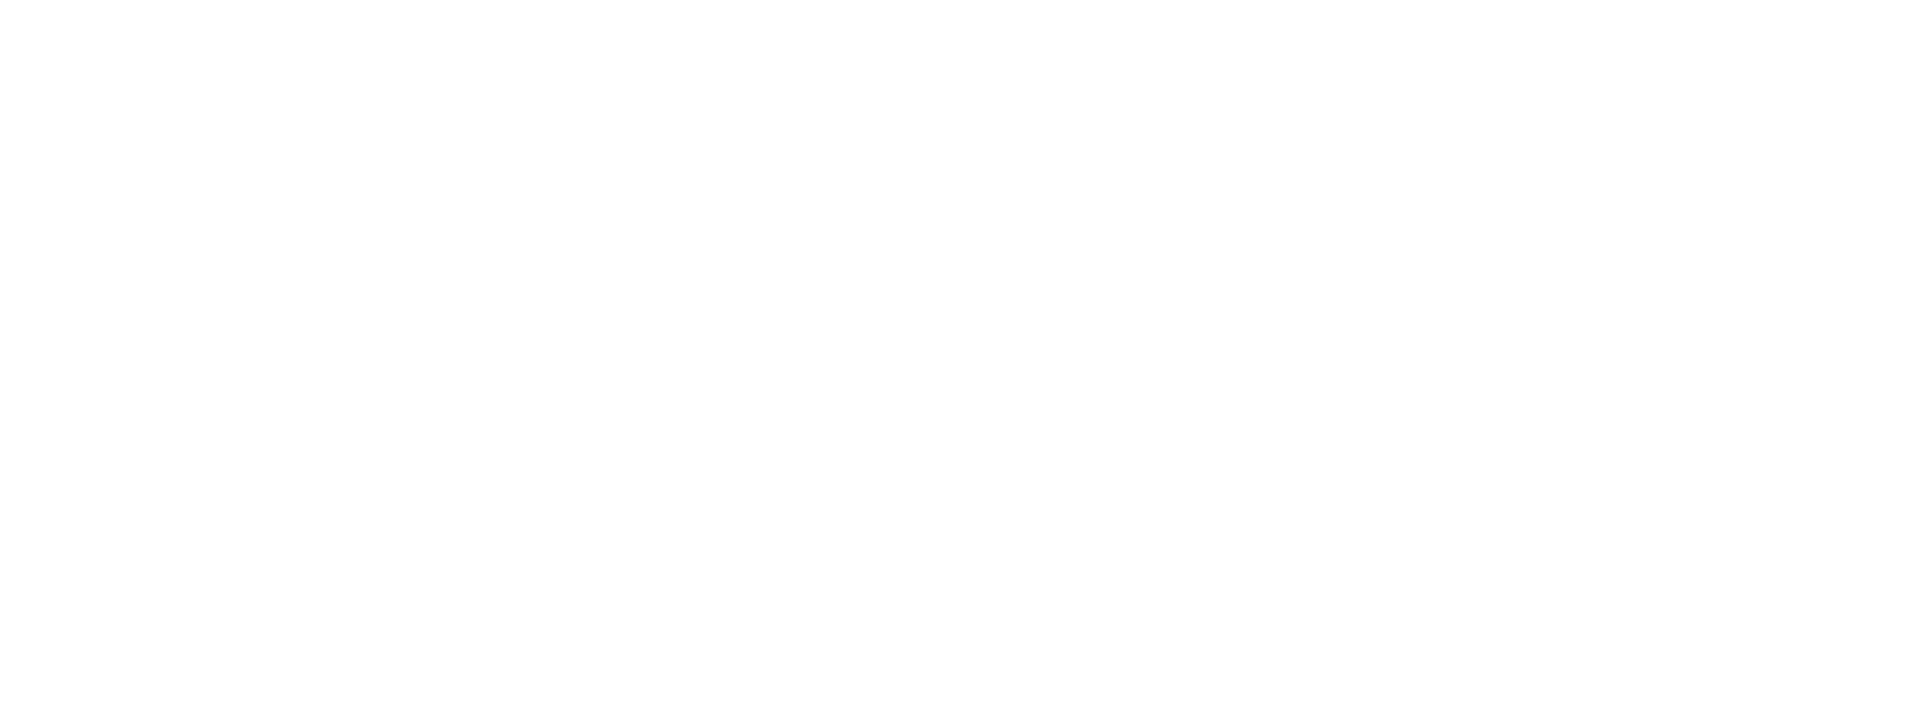 Snow Marketing blog | 小さな会社のネット集客専門家のブログ | 苫小牧市